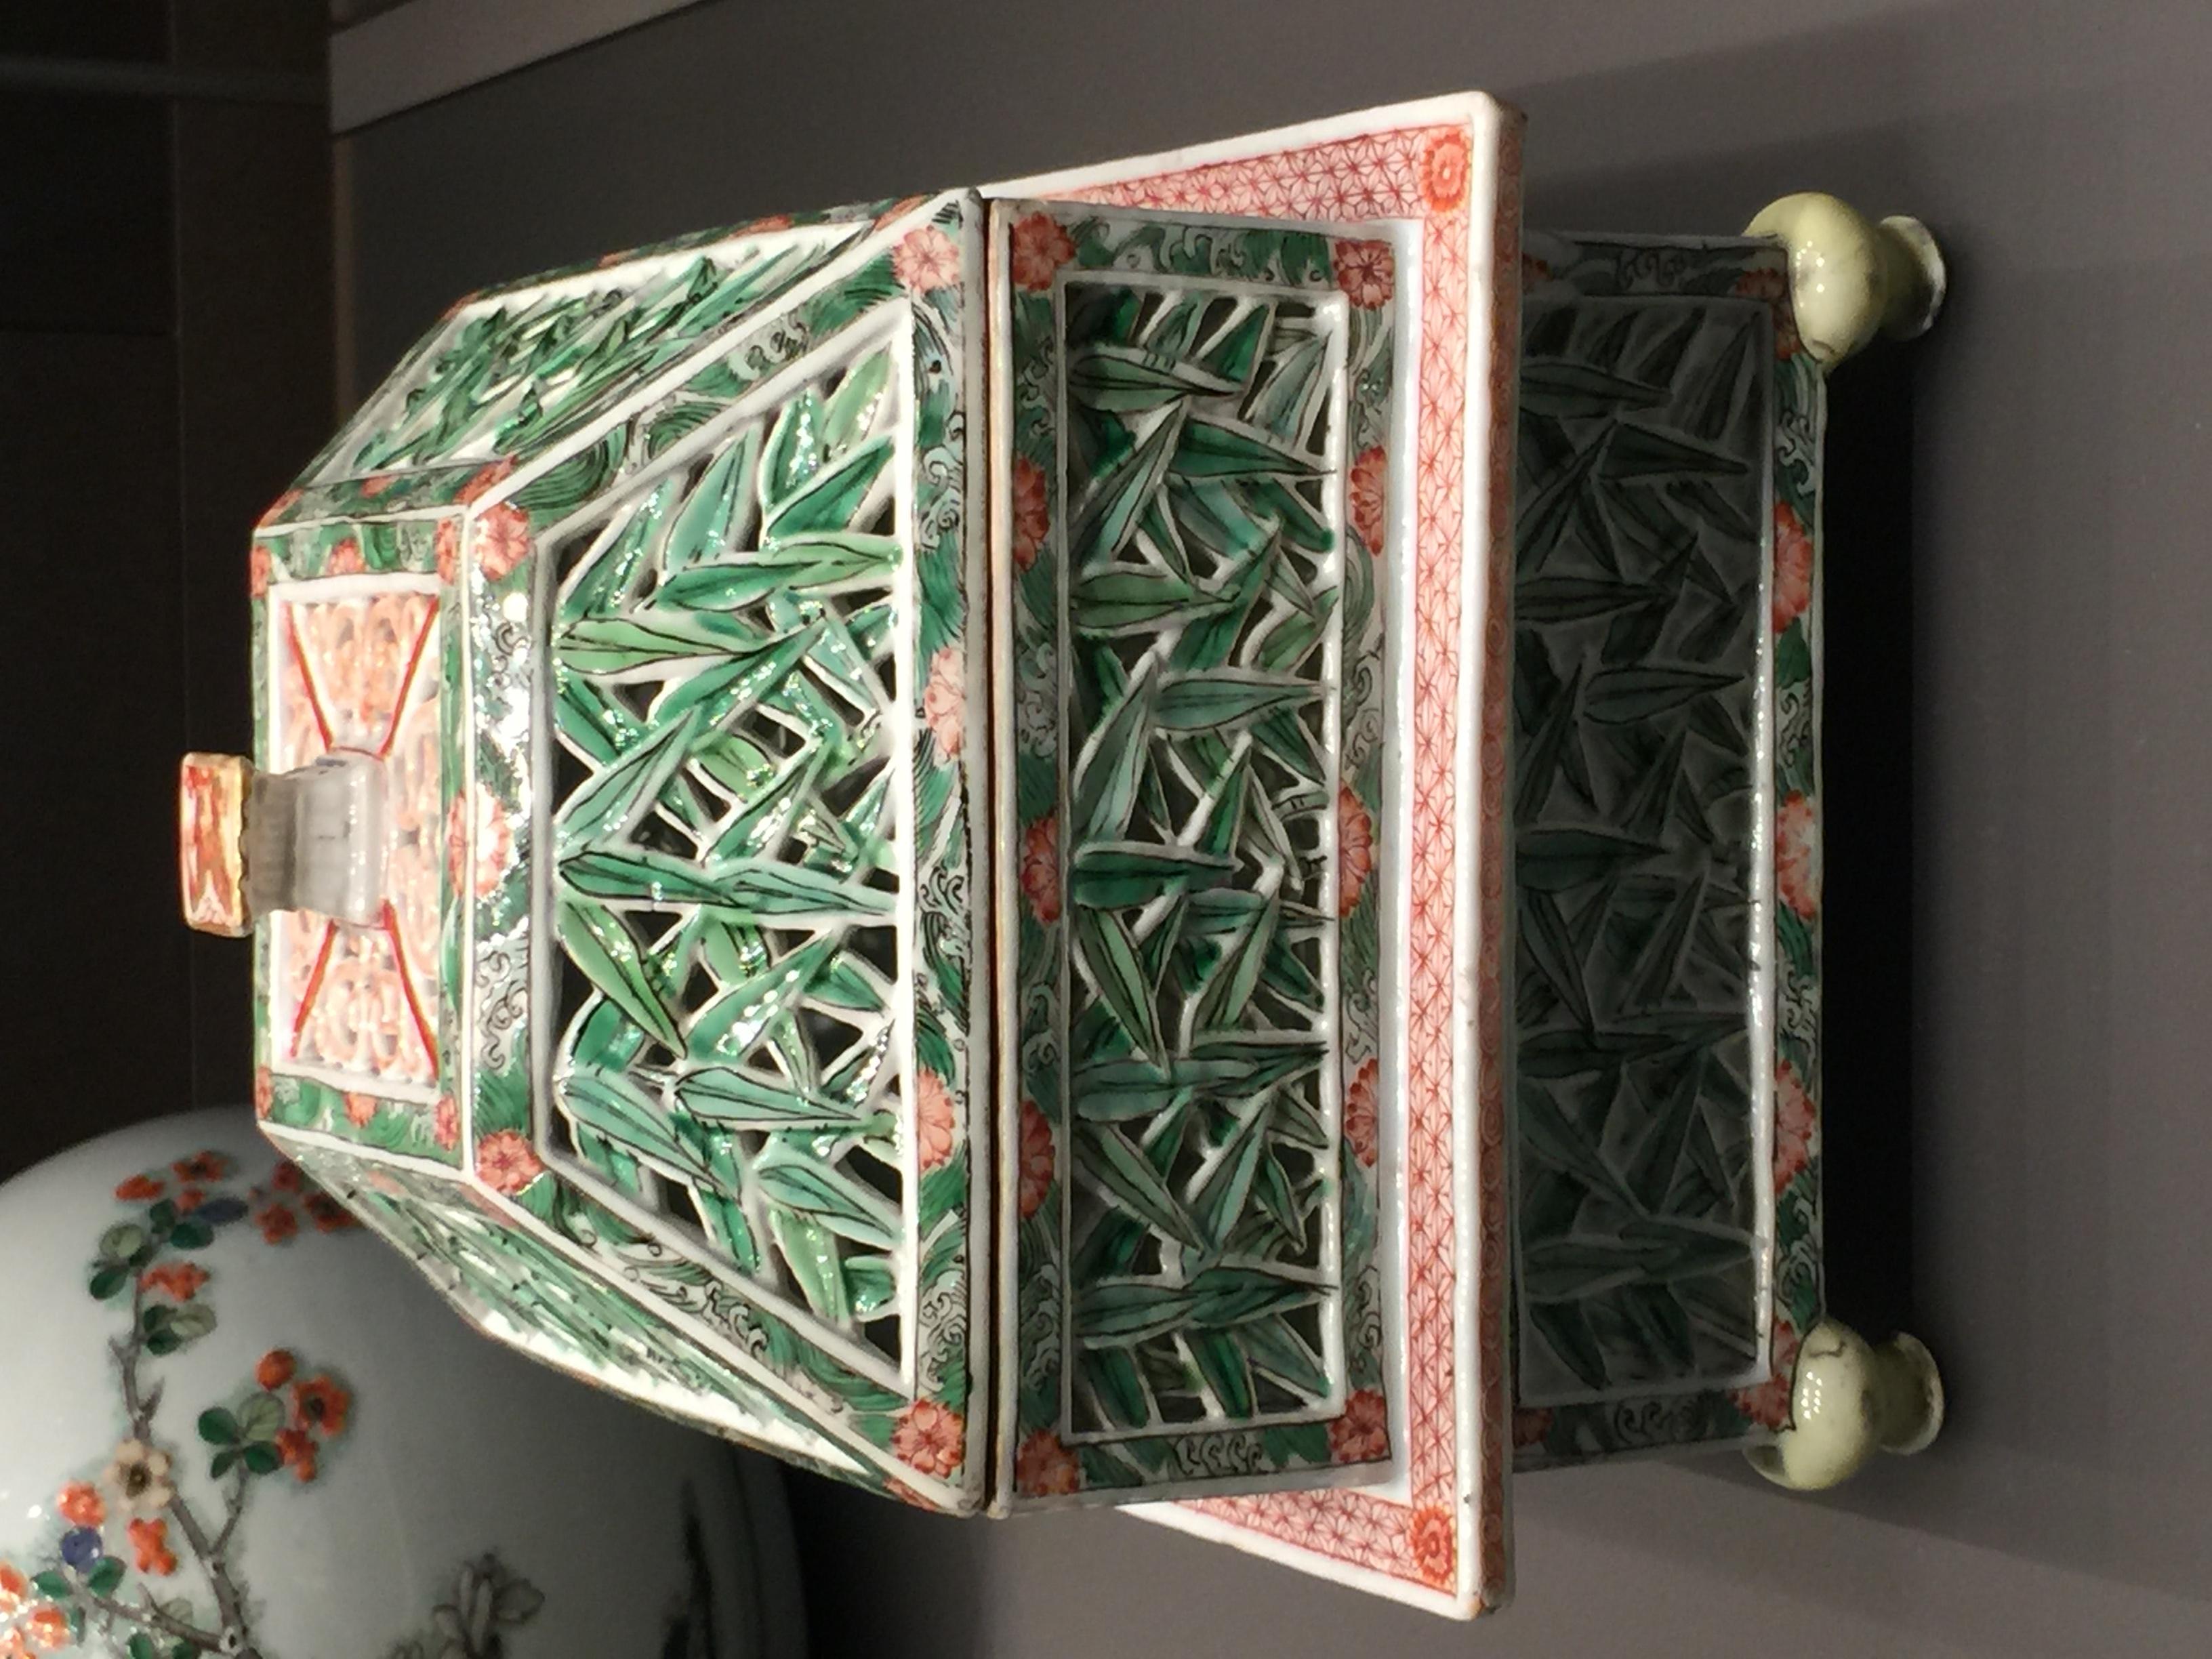 Chinese-Porcelain-British-Museum-Percival-David-jessewaugh.com-133.jpg